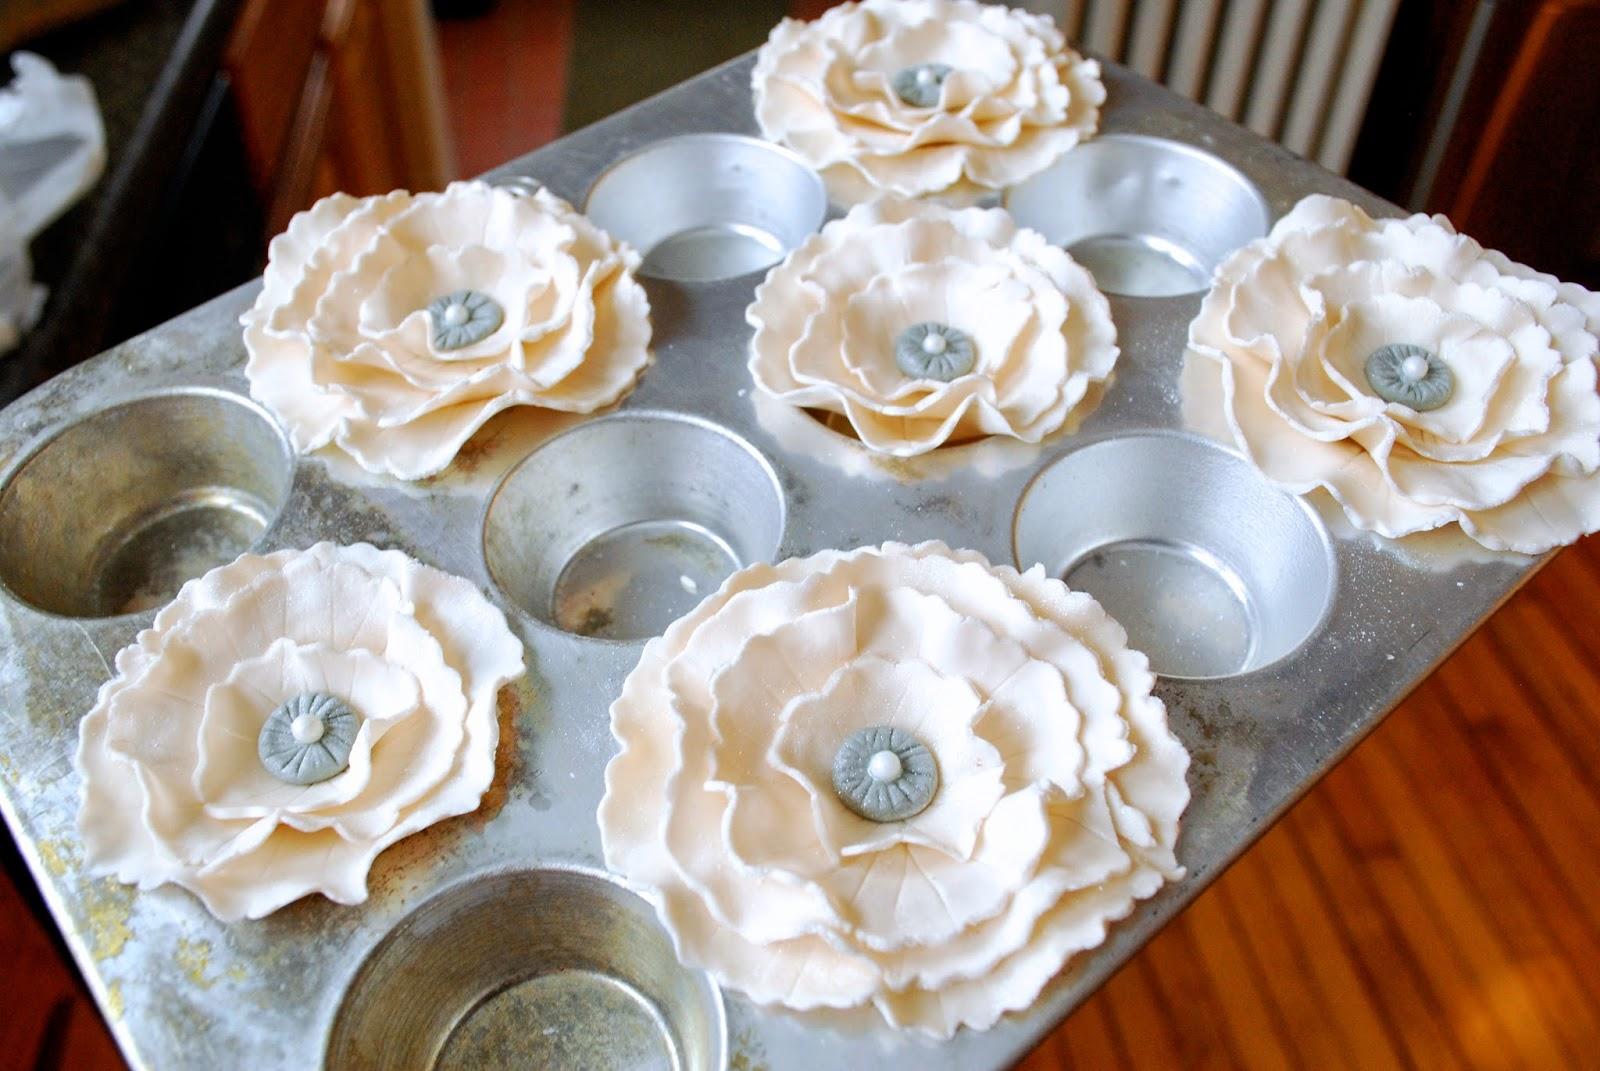 fondant flowers drying on muffin tin